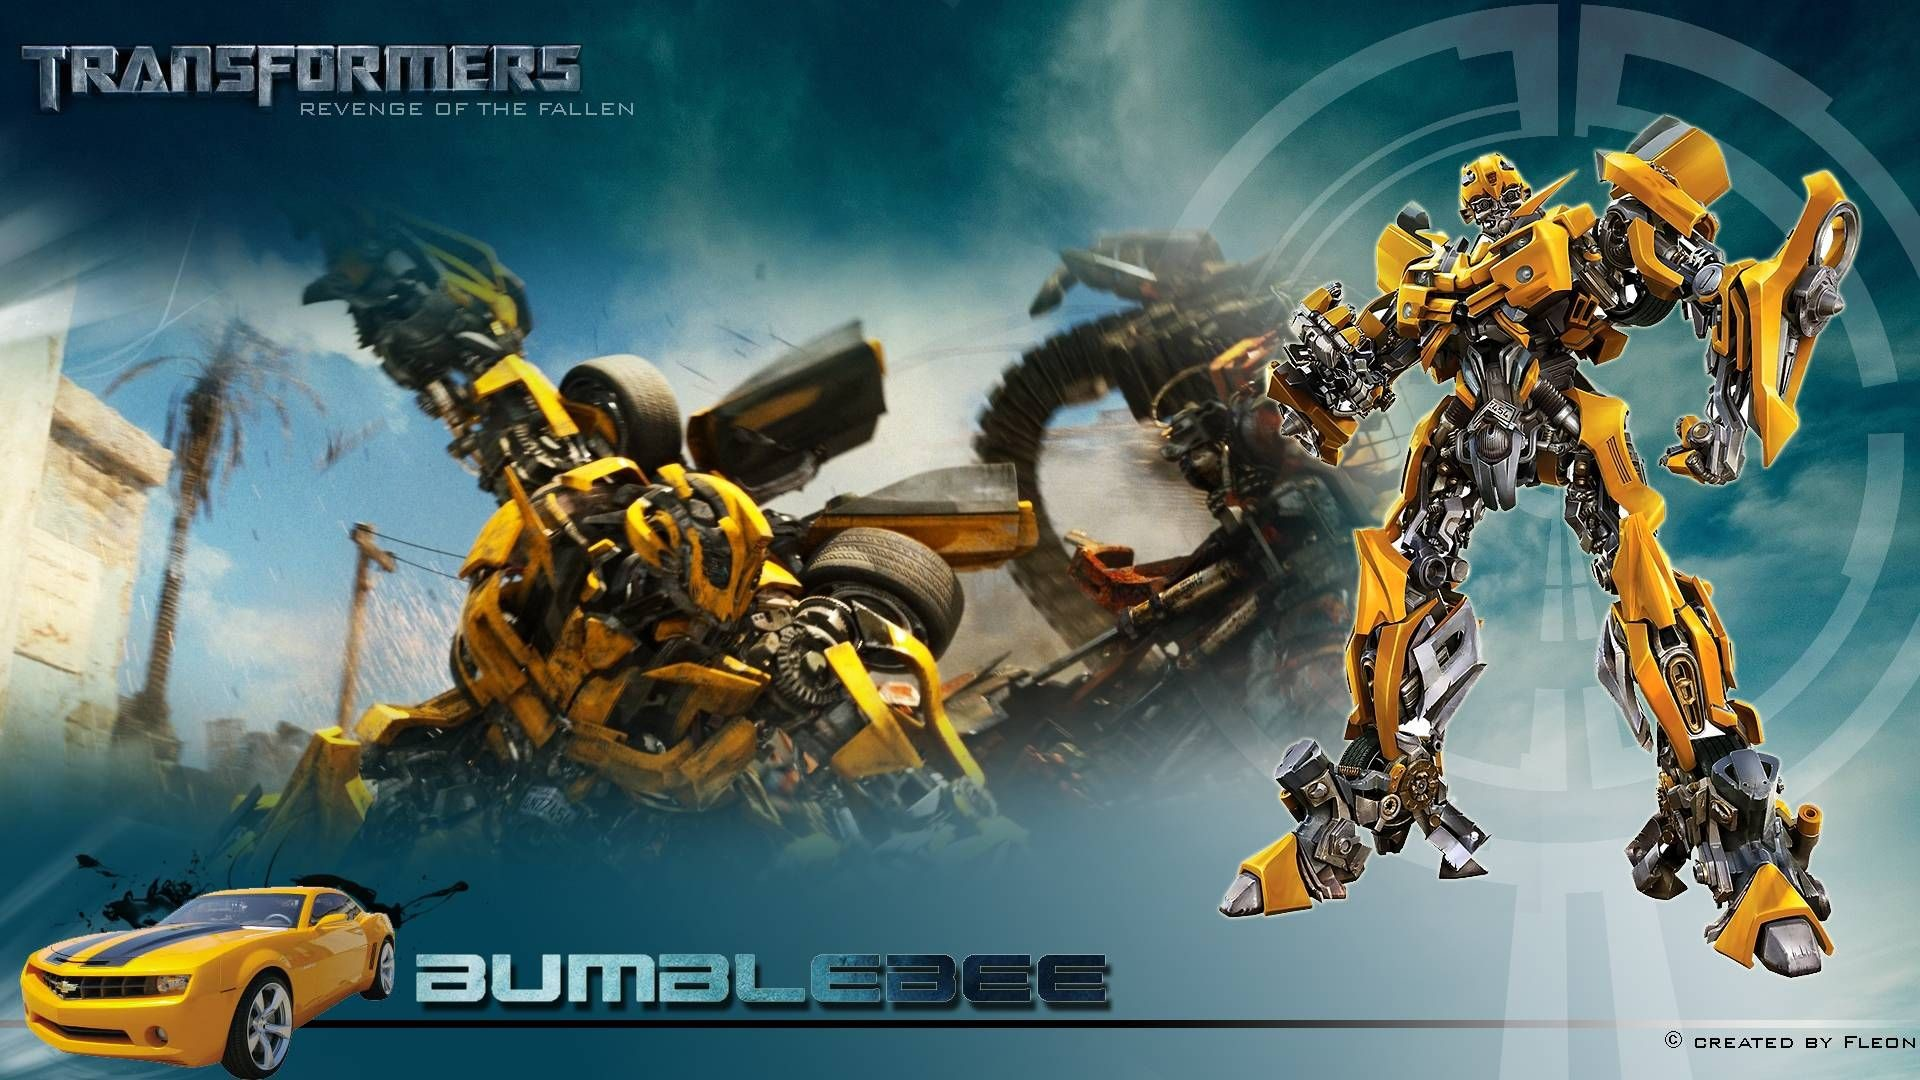 Res: 1920x1080, Transformers Bumblebee Wallpapers Wallpaper